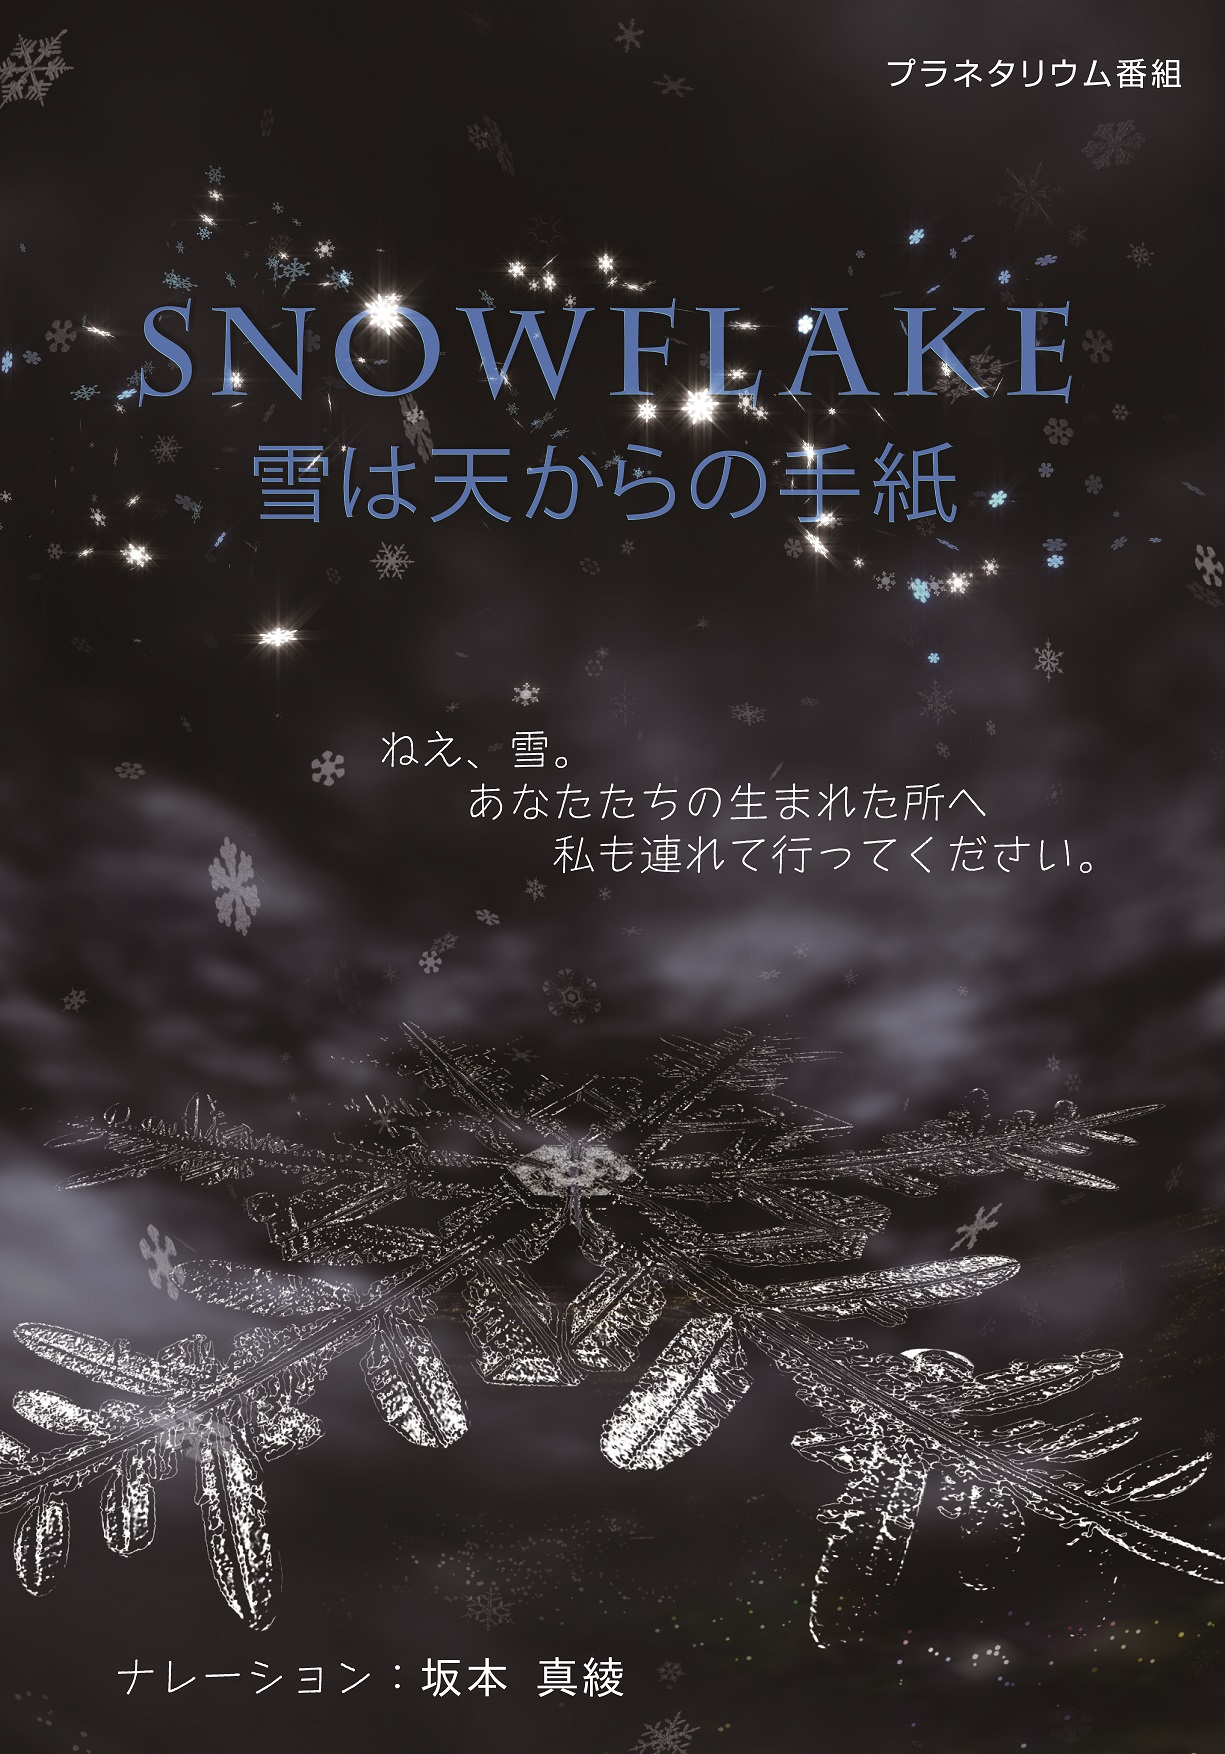 SNOWFLAKE 雪は天からの手紙)